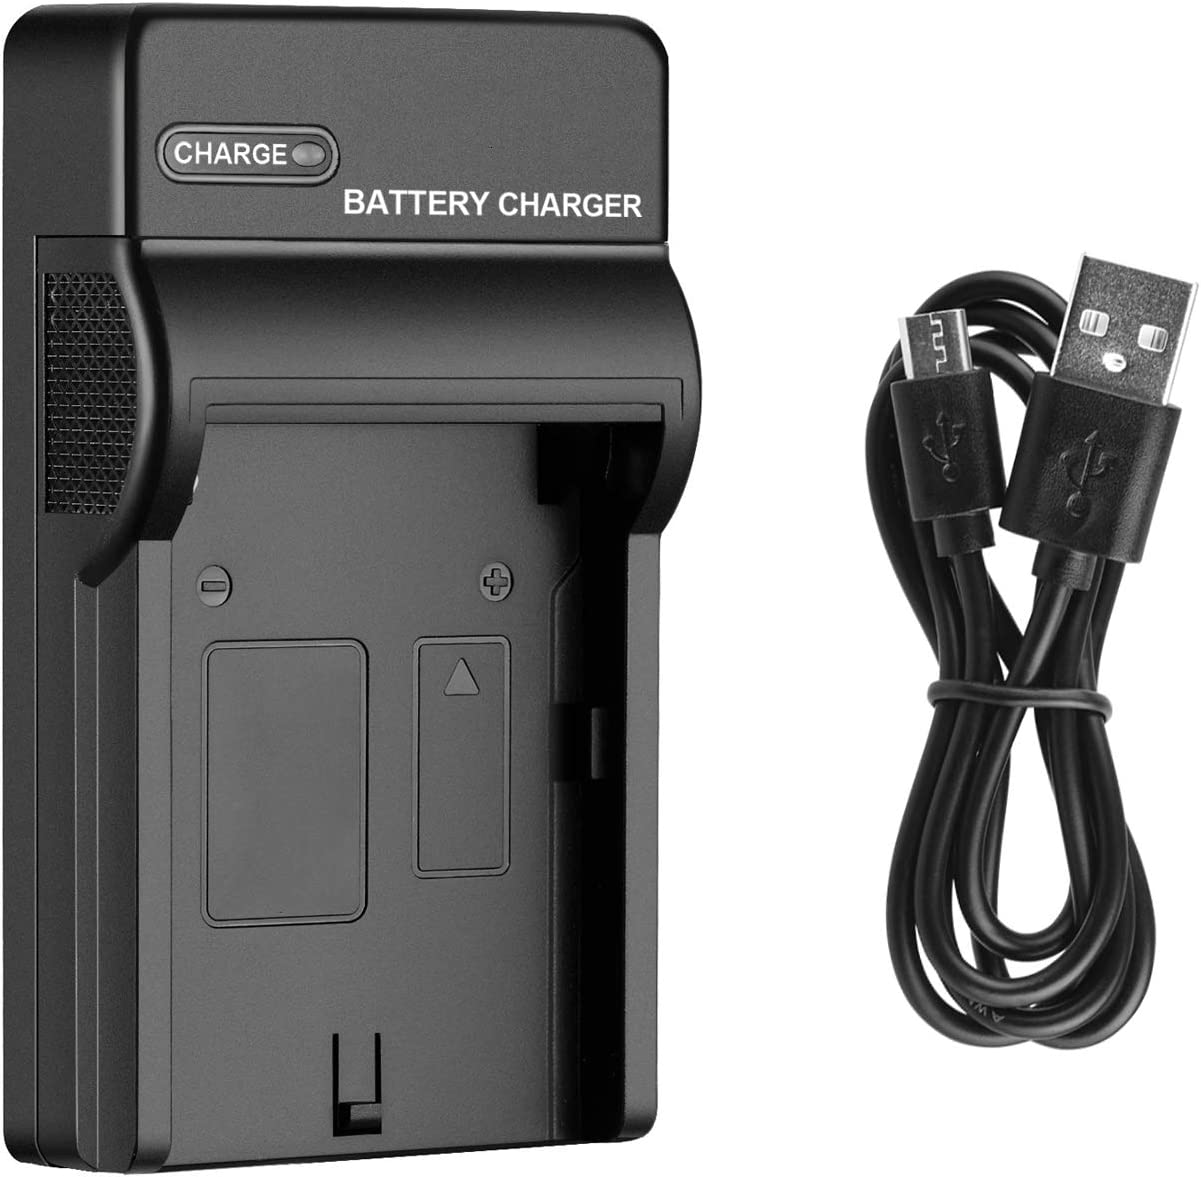 USB Battery Charger San Diego Mall for Fujifilm X20 XF1 X10 Digital Camera Virginia Beach Mall